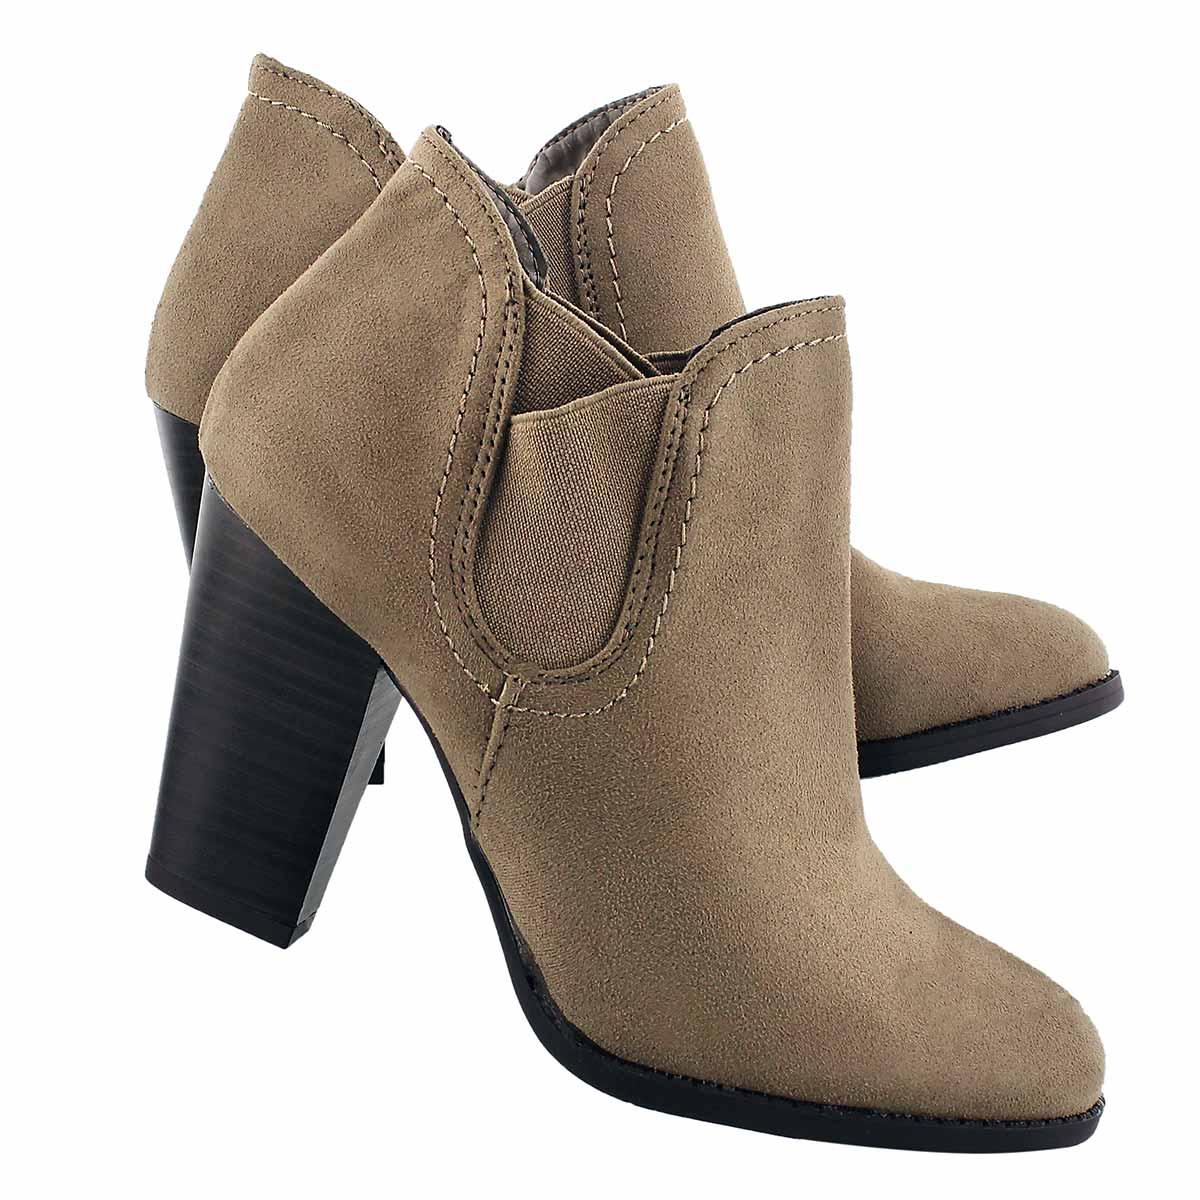 Lds Daphne cement lo dress ankle boot